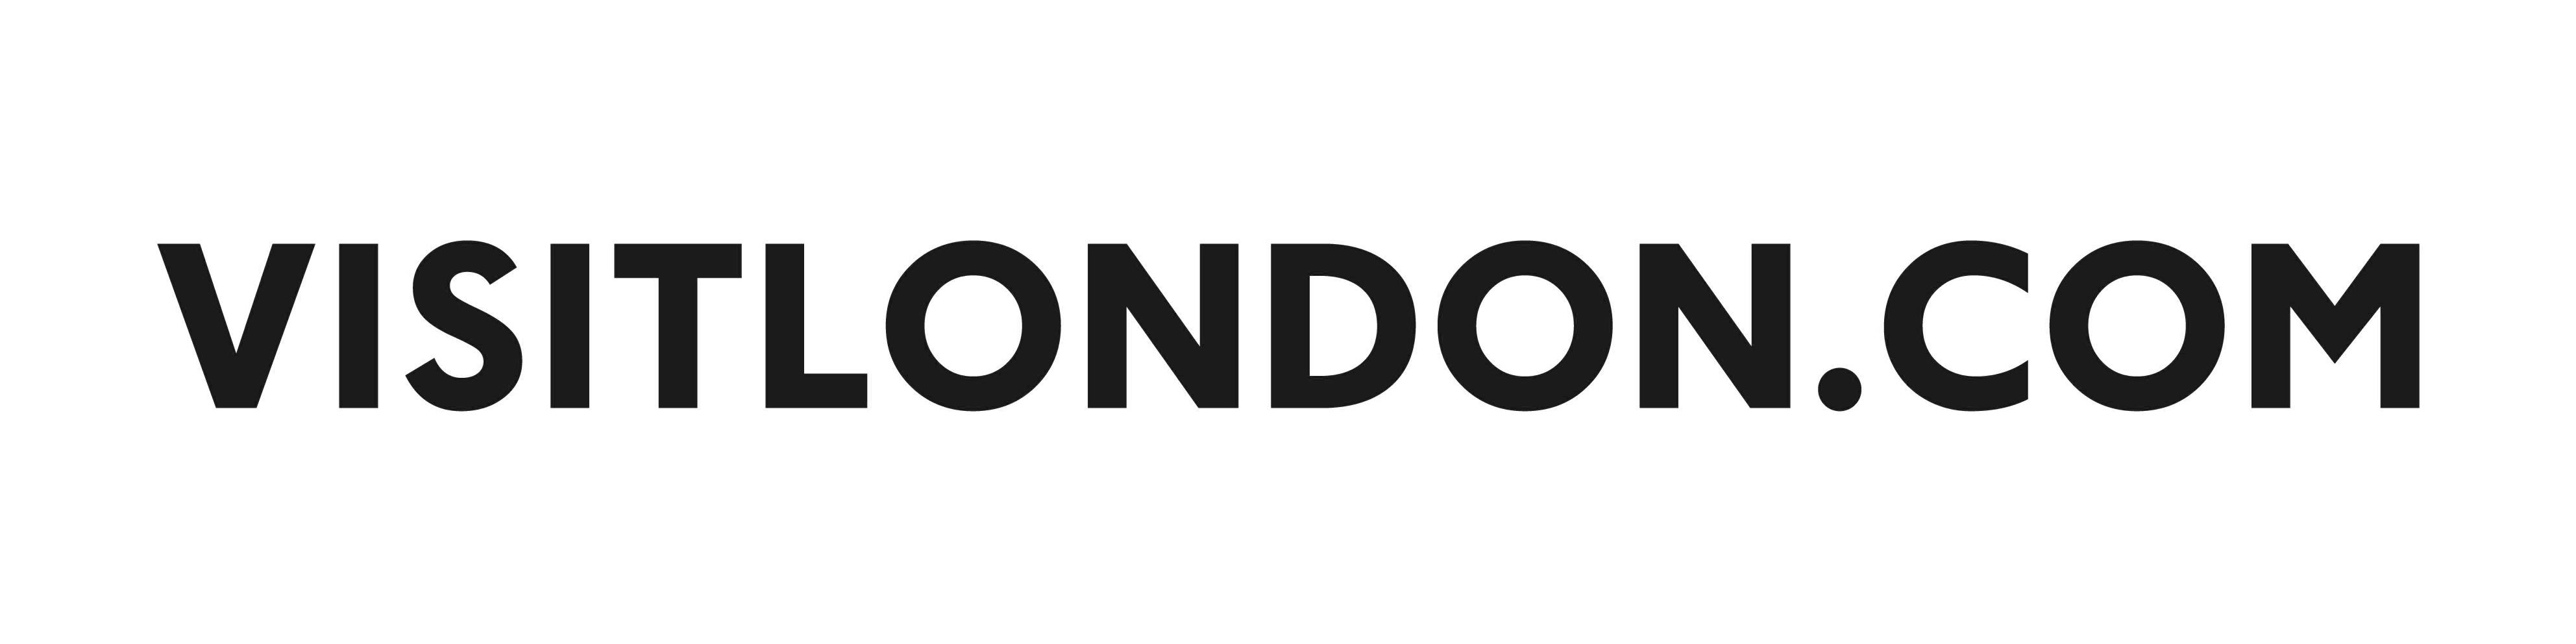 Visitlondon.com